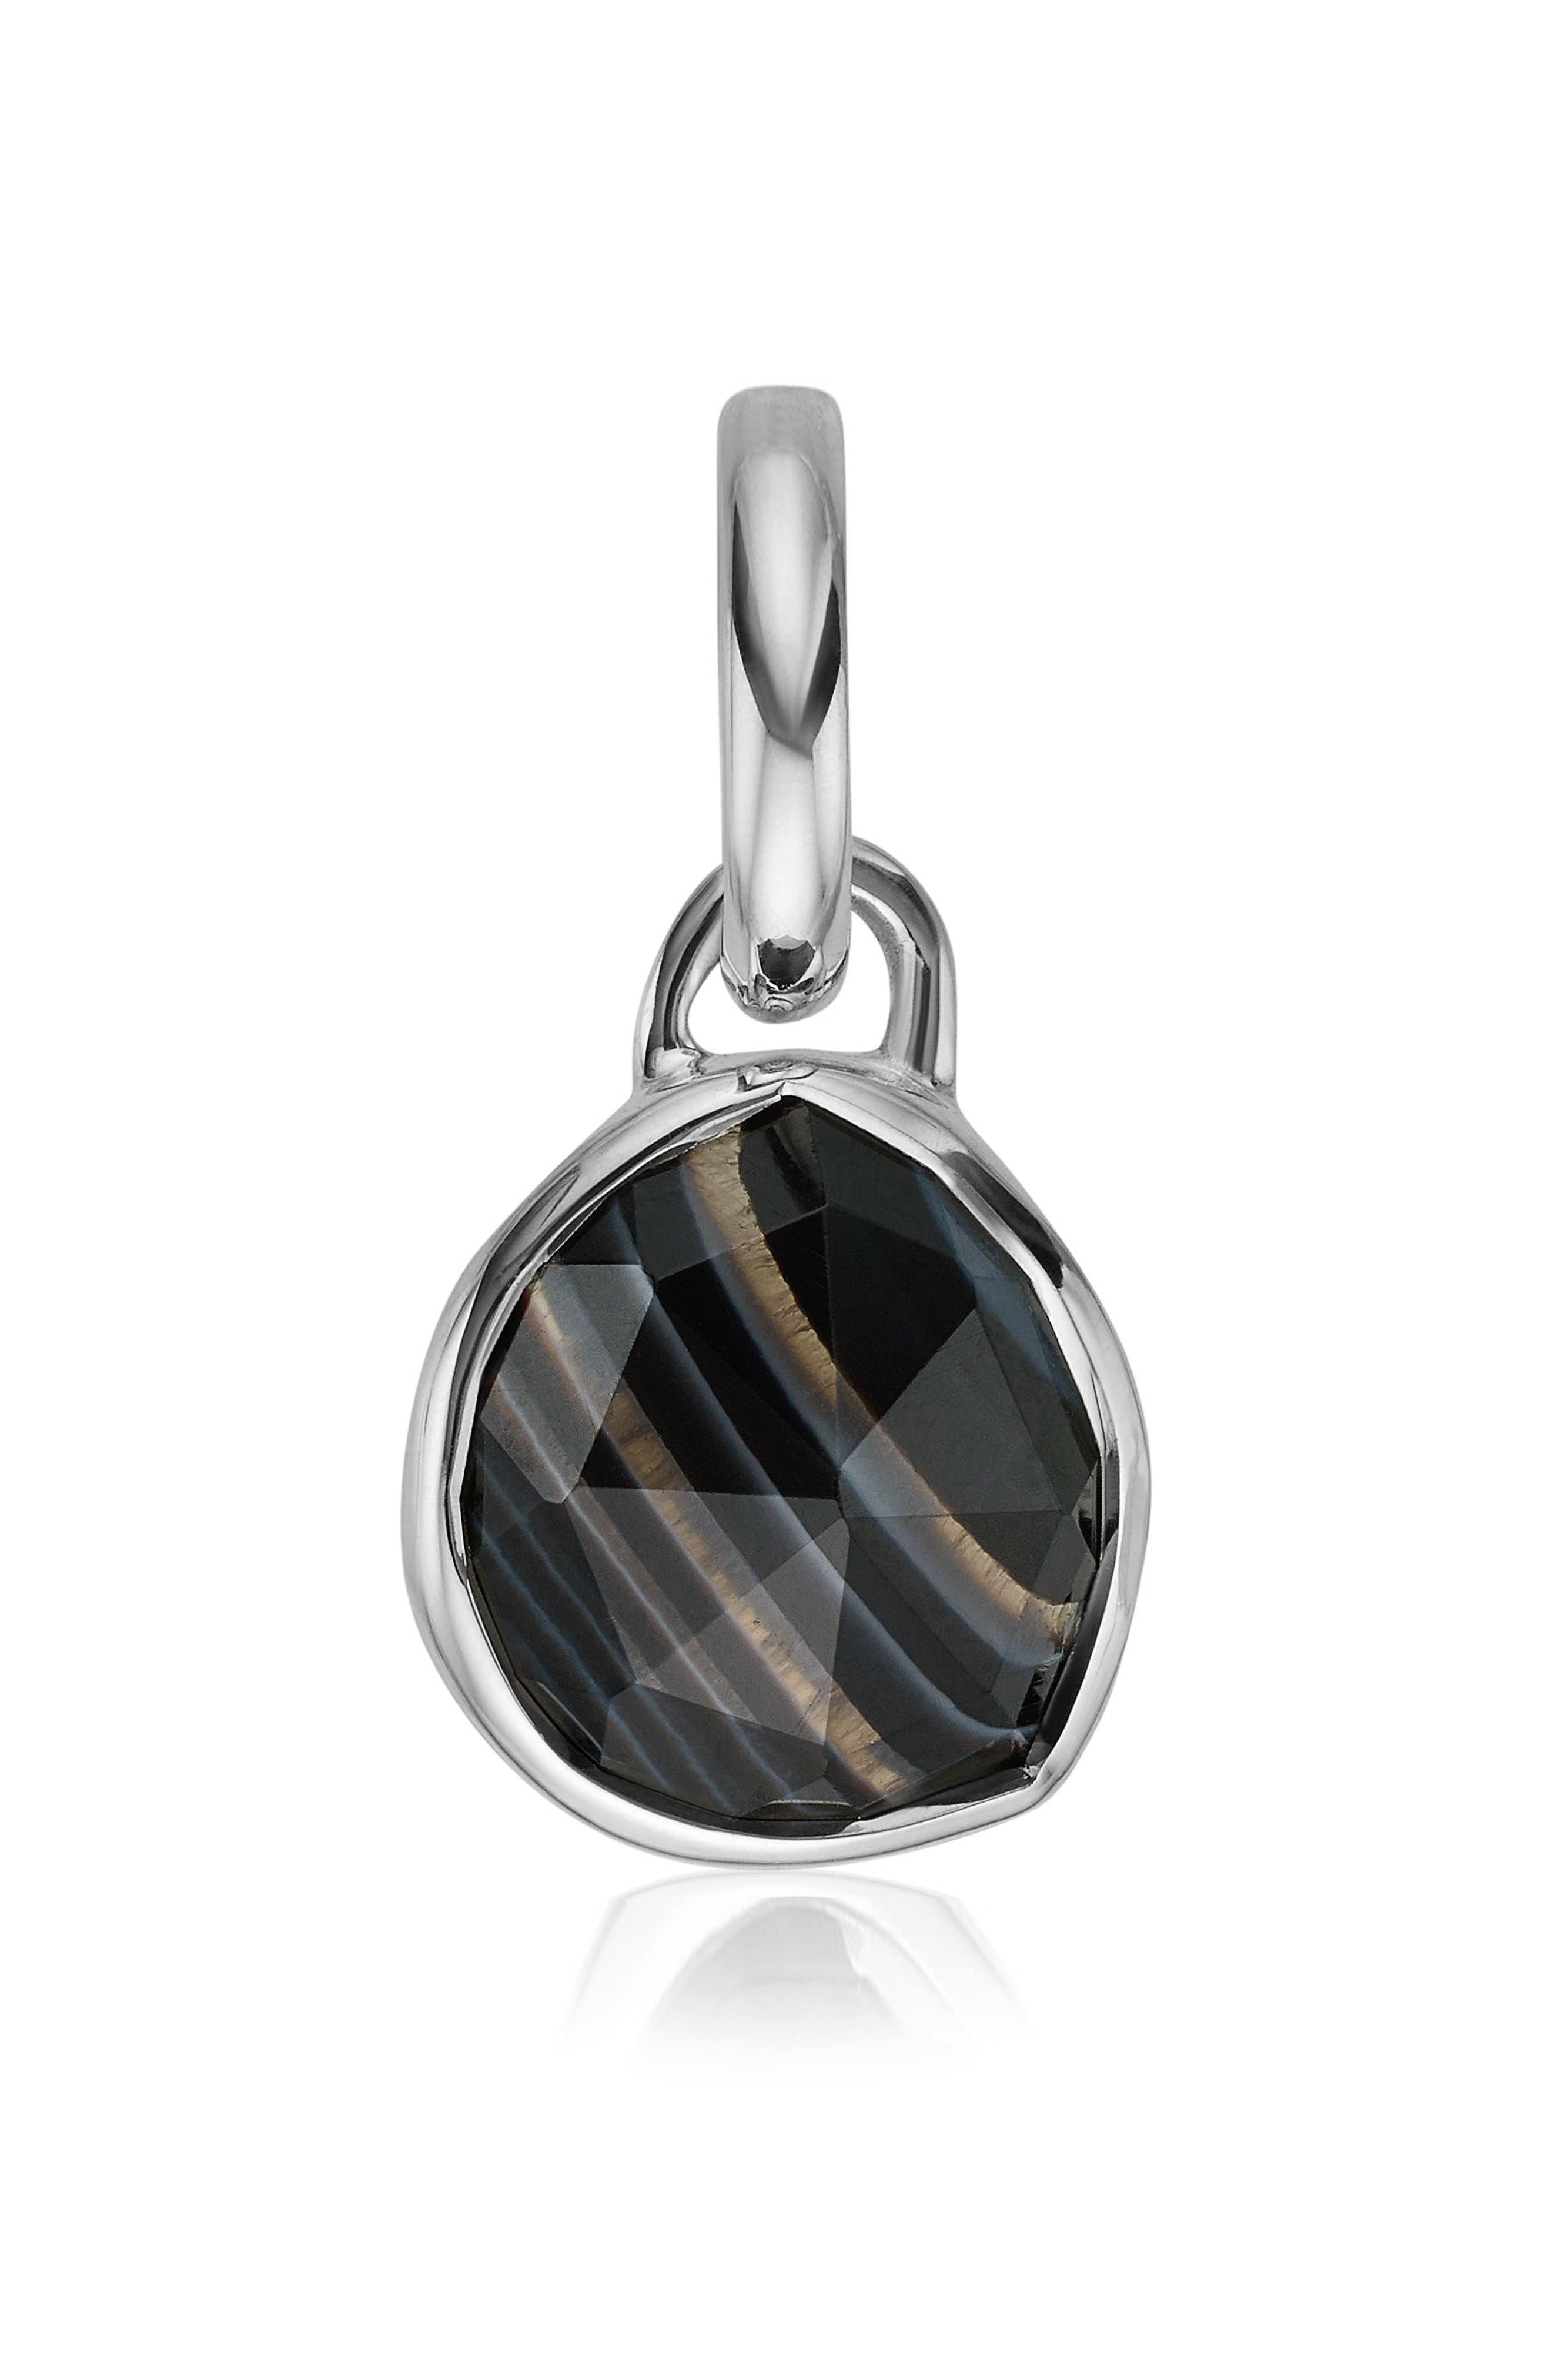 Siren Black Line Onyx Pendant,                             Main thumbnail 1, color,                             Silver/ Black Line Onyx